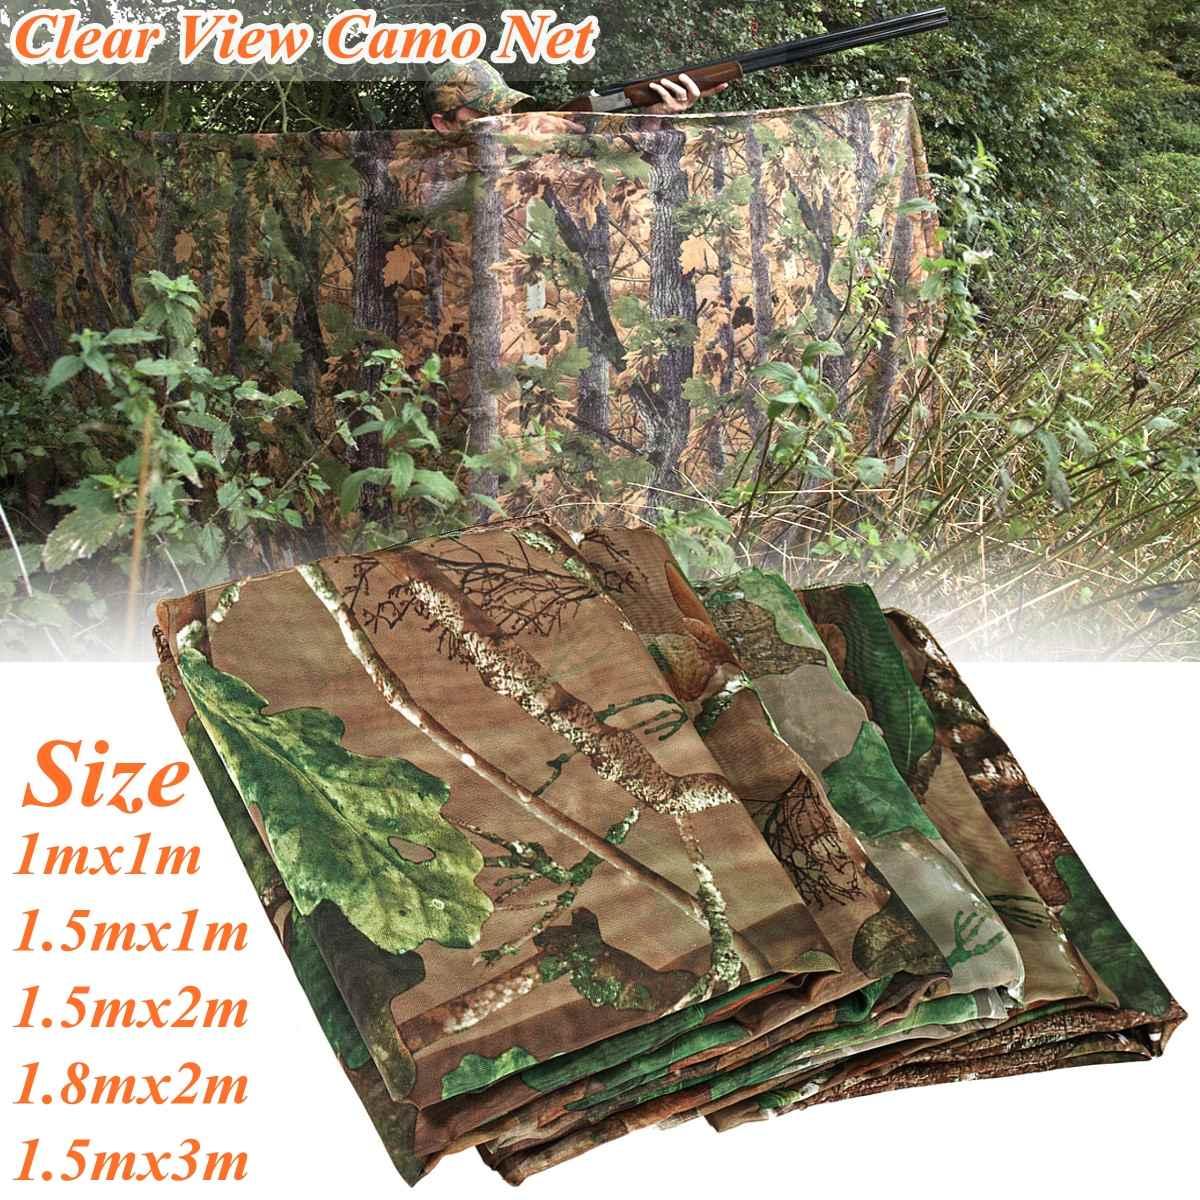 Multifunction Camo Net Hide Netting Birds Decoy Hunting Woodland Camping Military Camouflage Netting Mesh